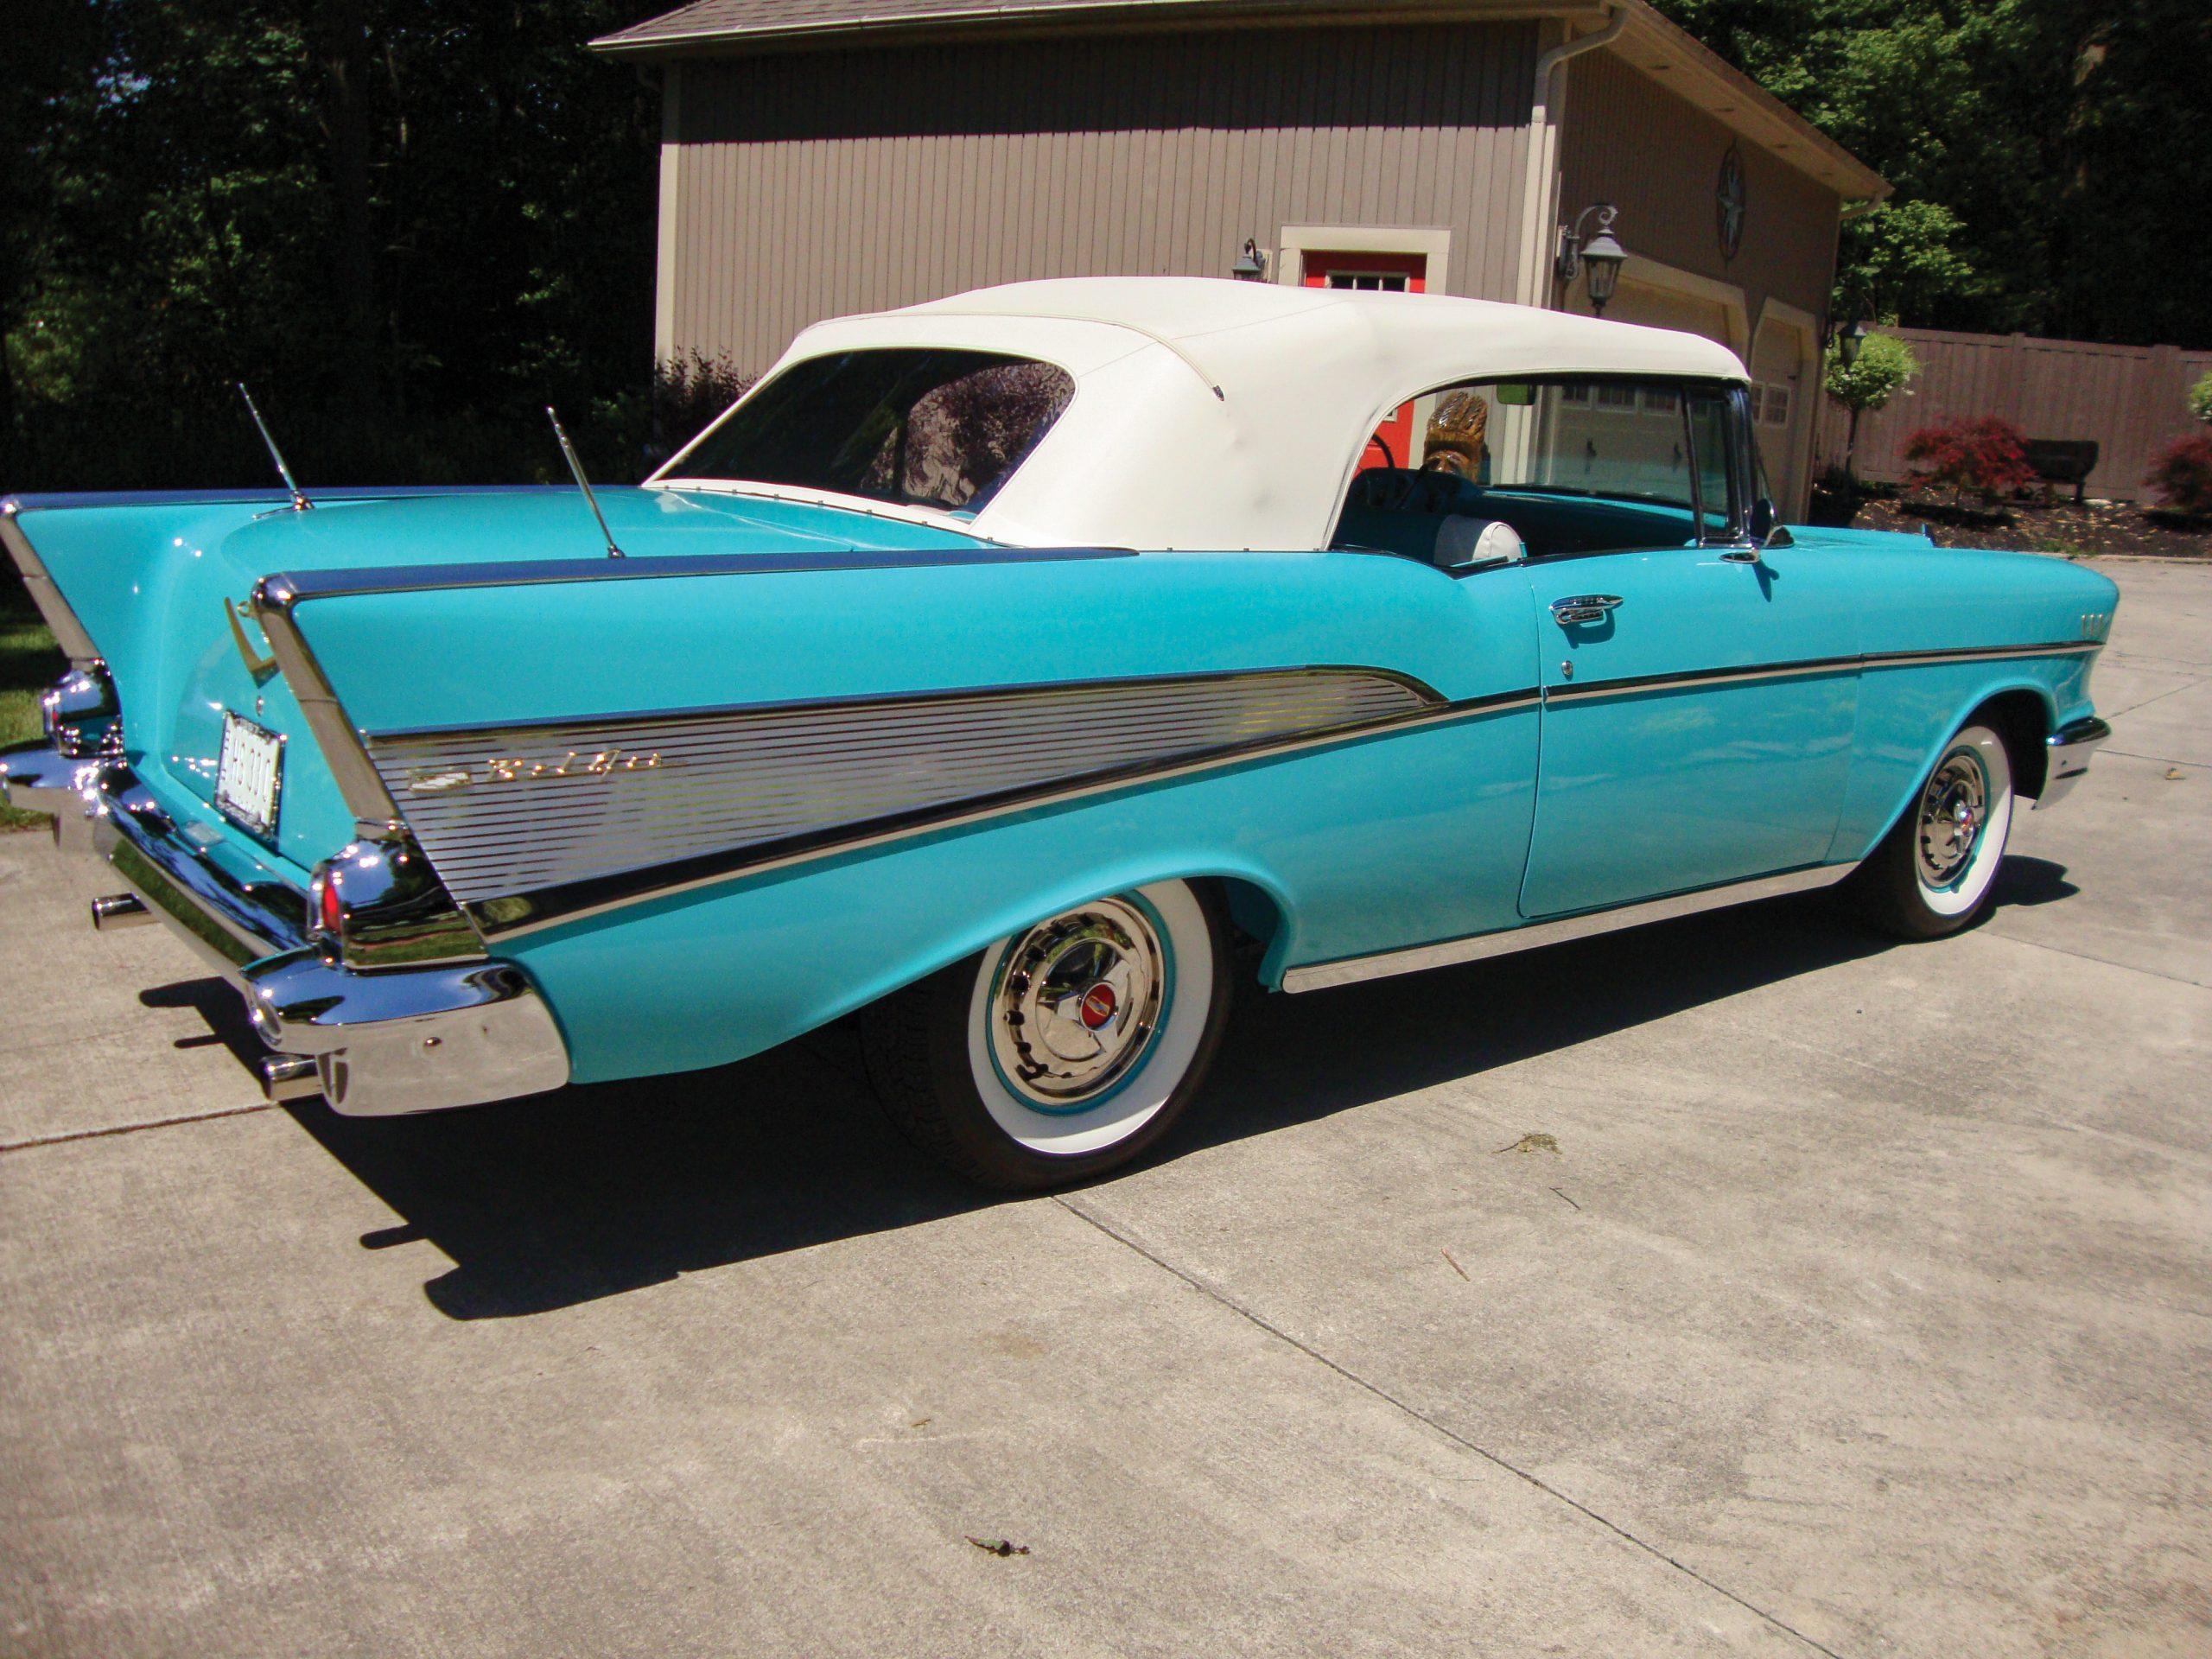 1957-Chevrolet-Bel-Air-Convertible-rear